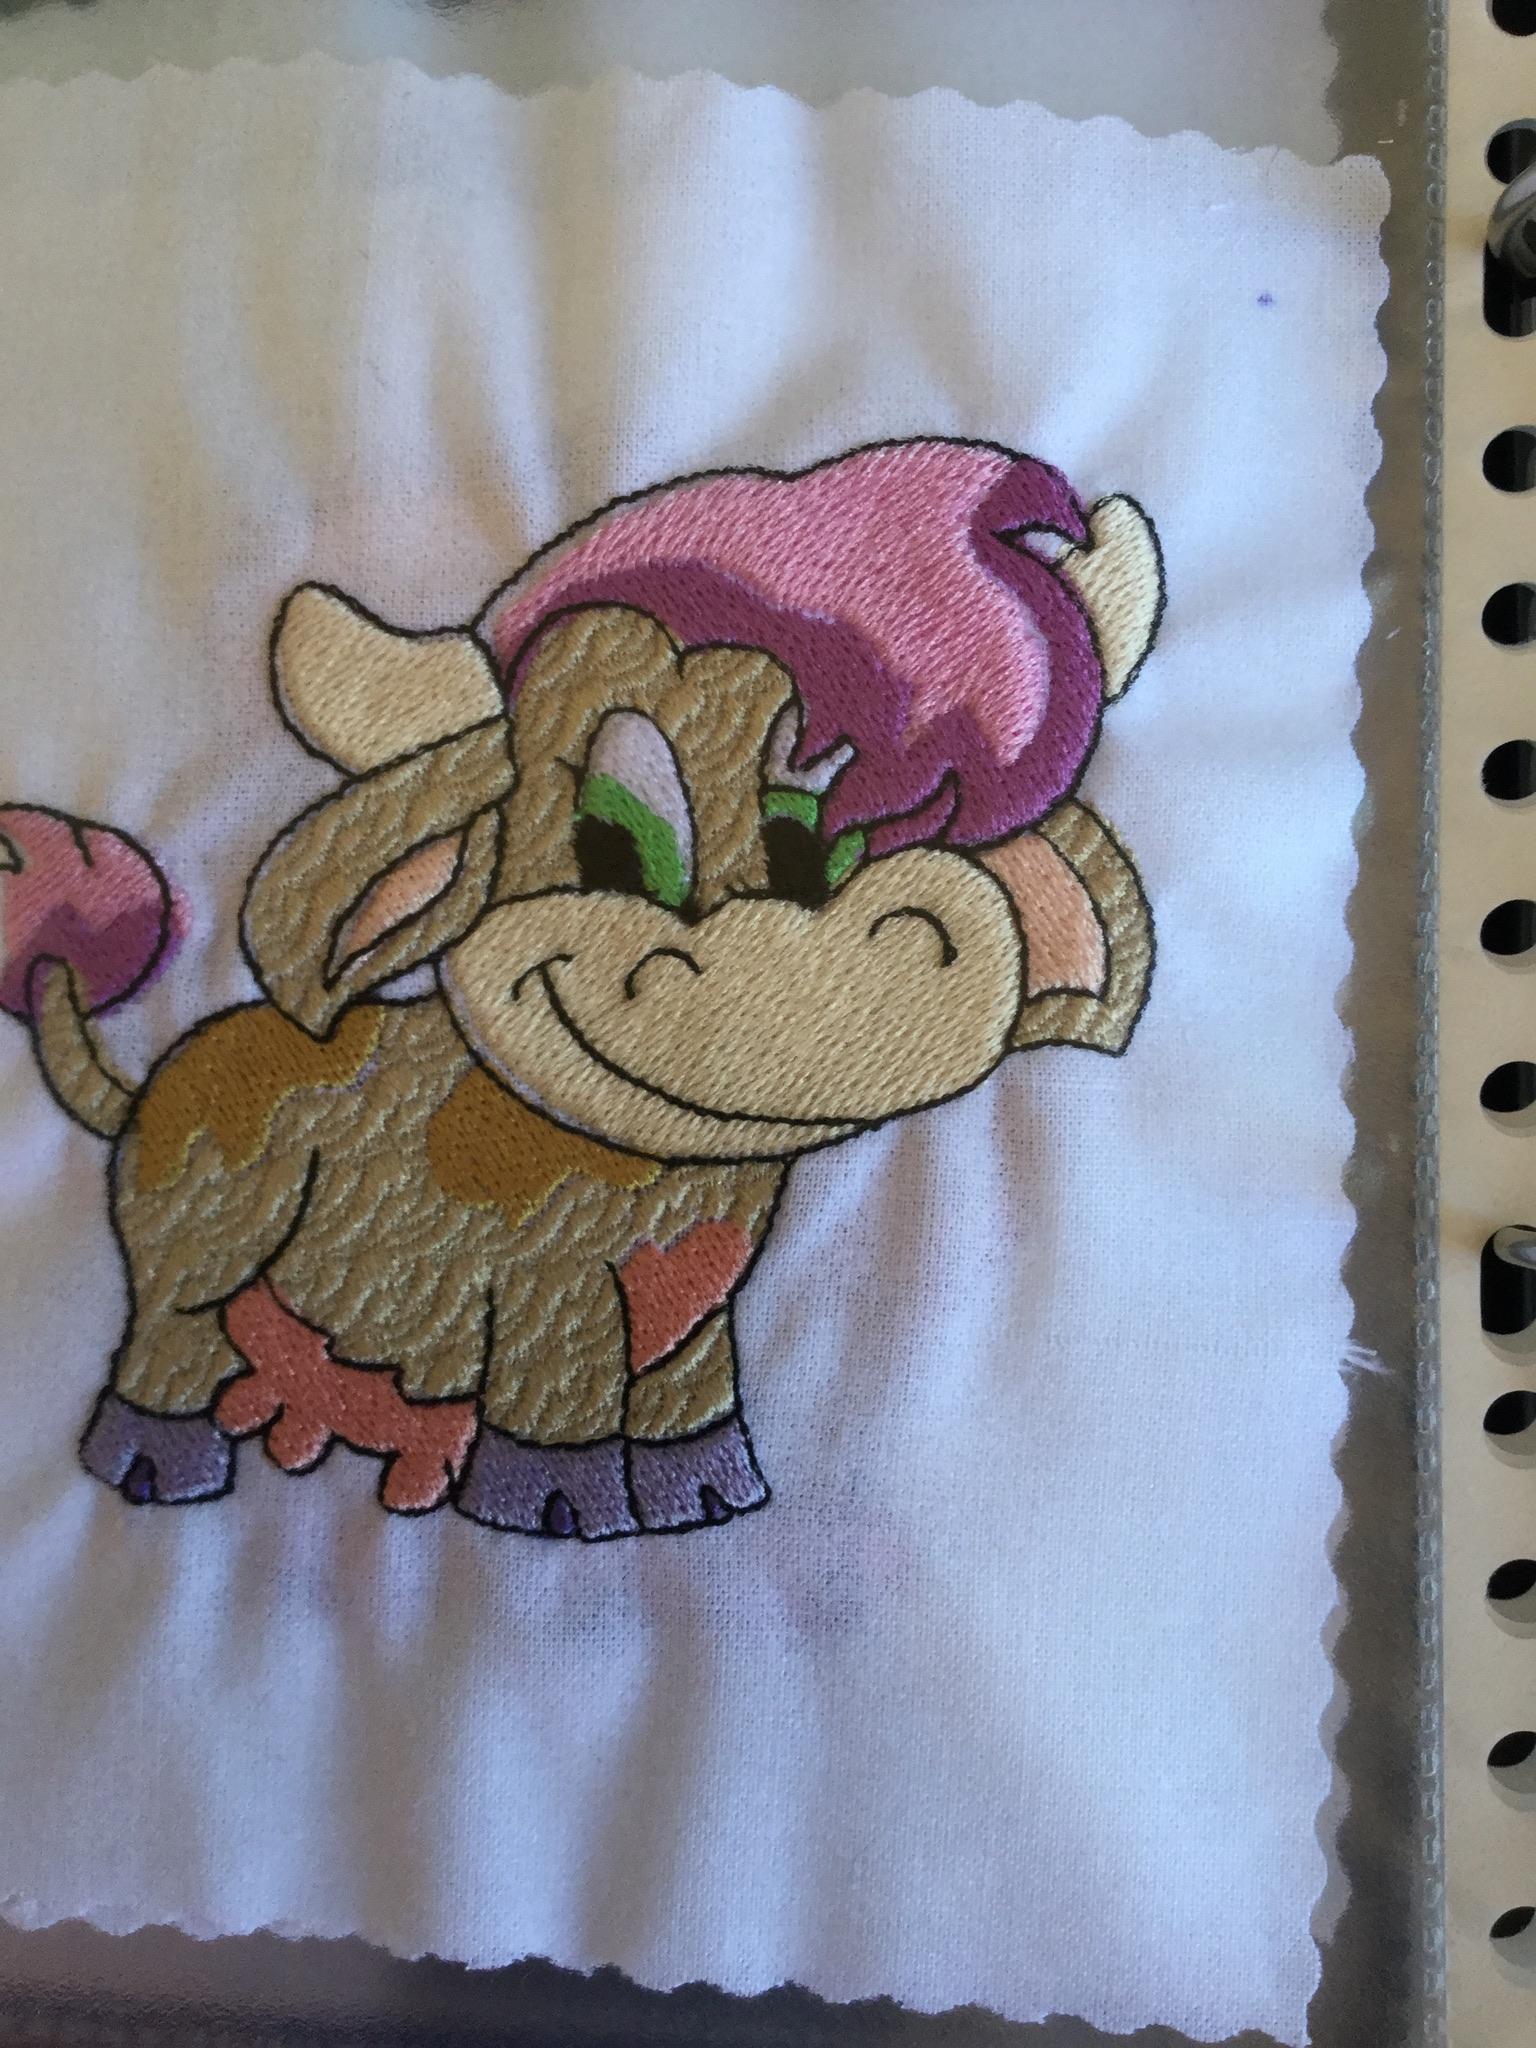 Embroidery/IMG_2606.JPG